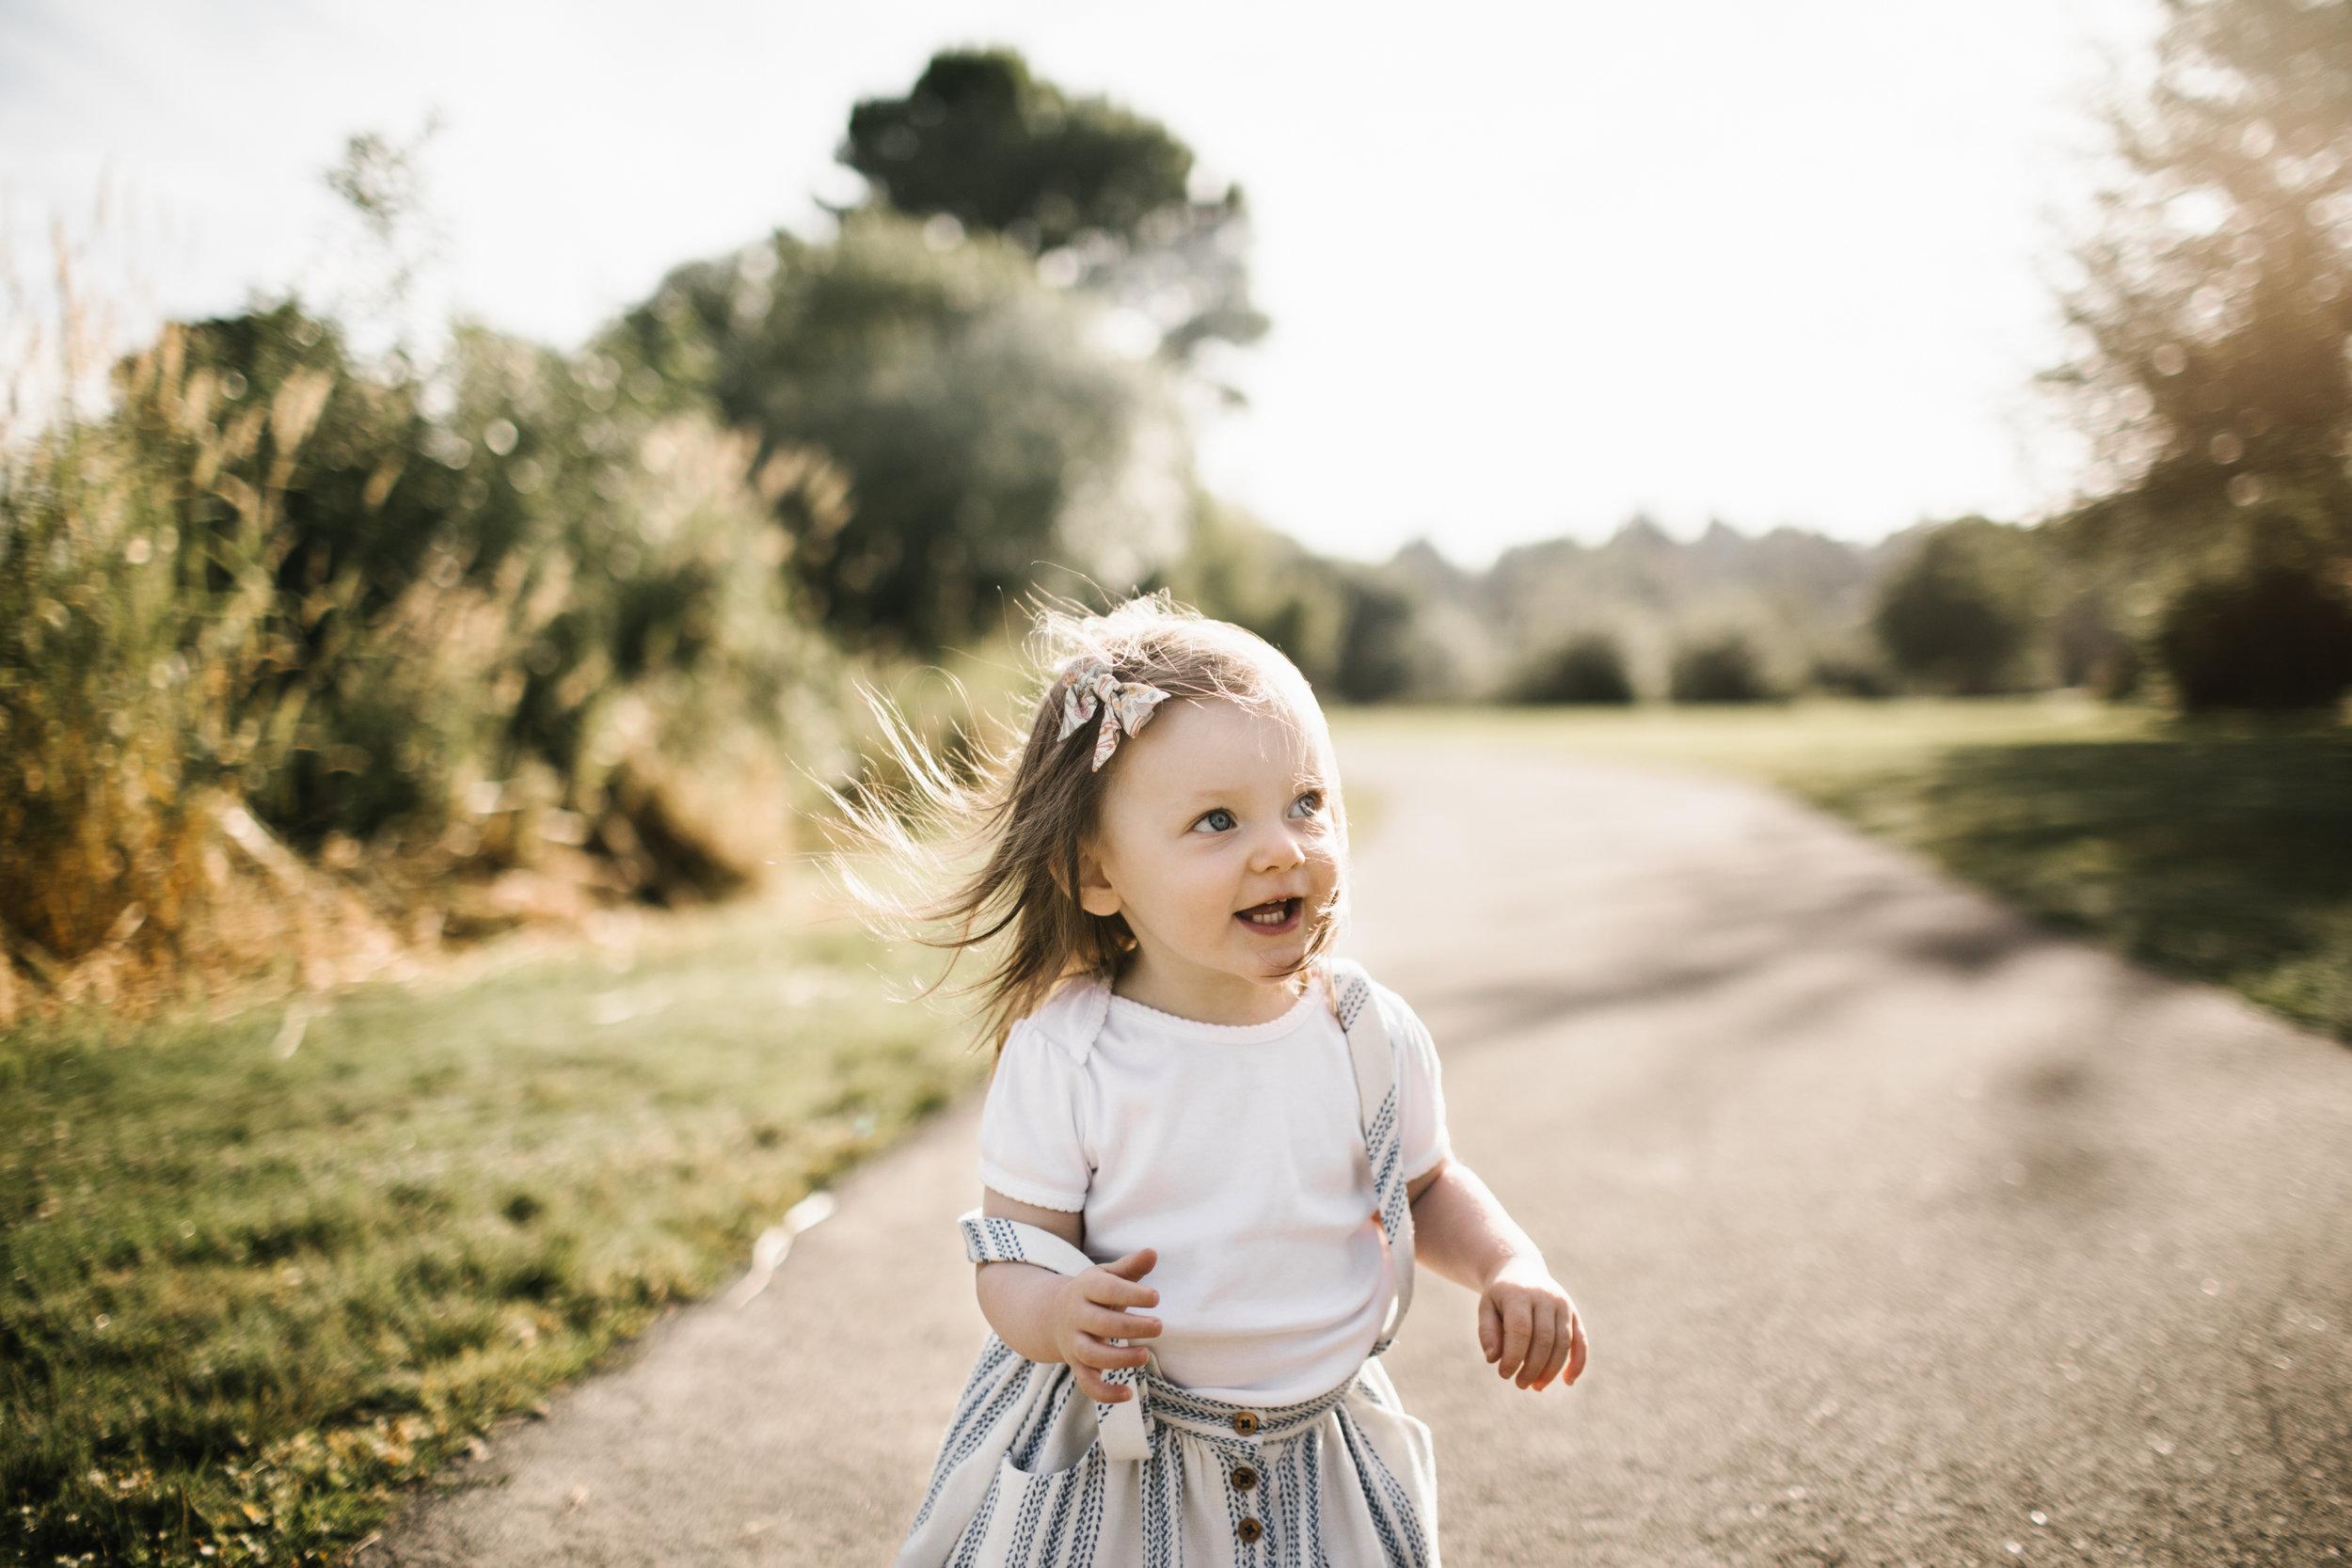 Smiling toddler girl on path